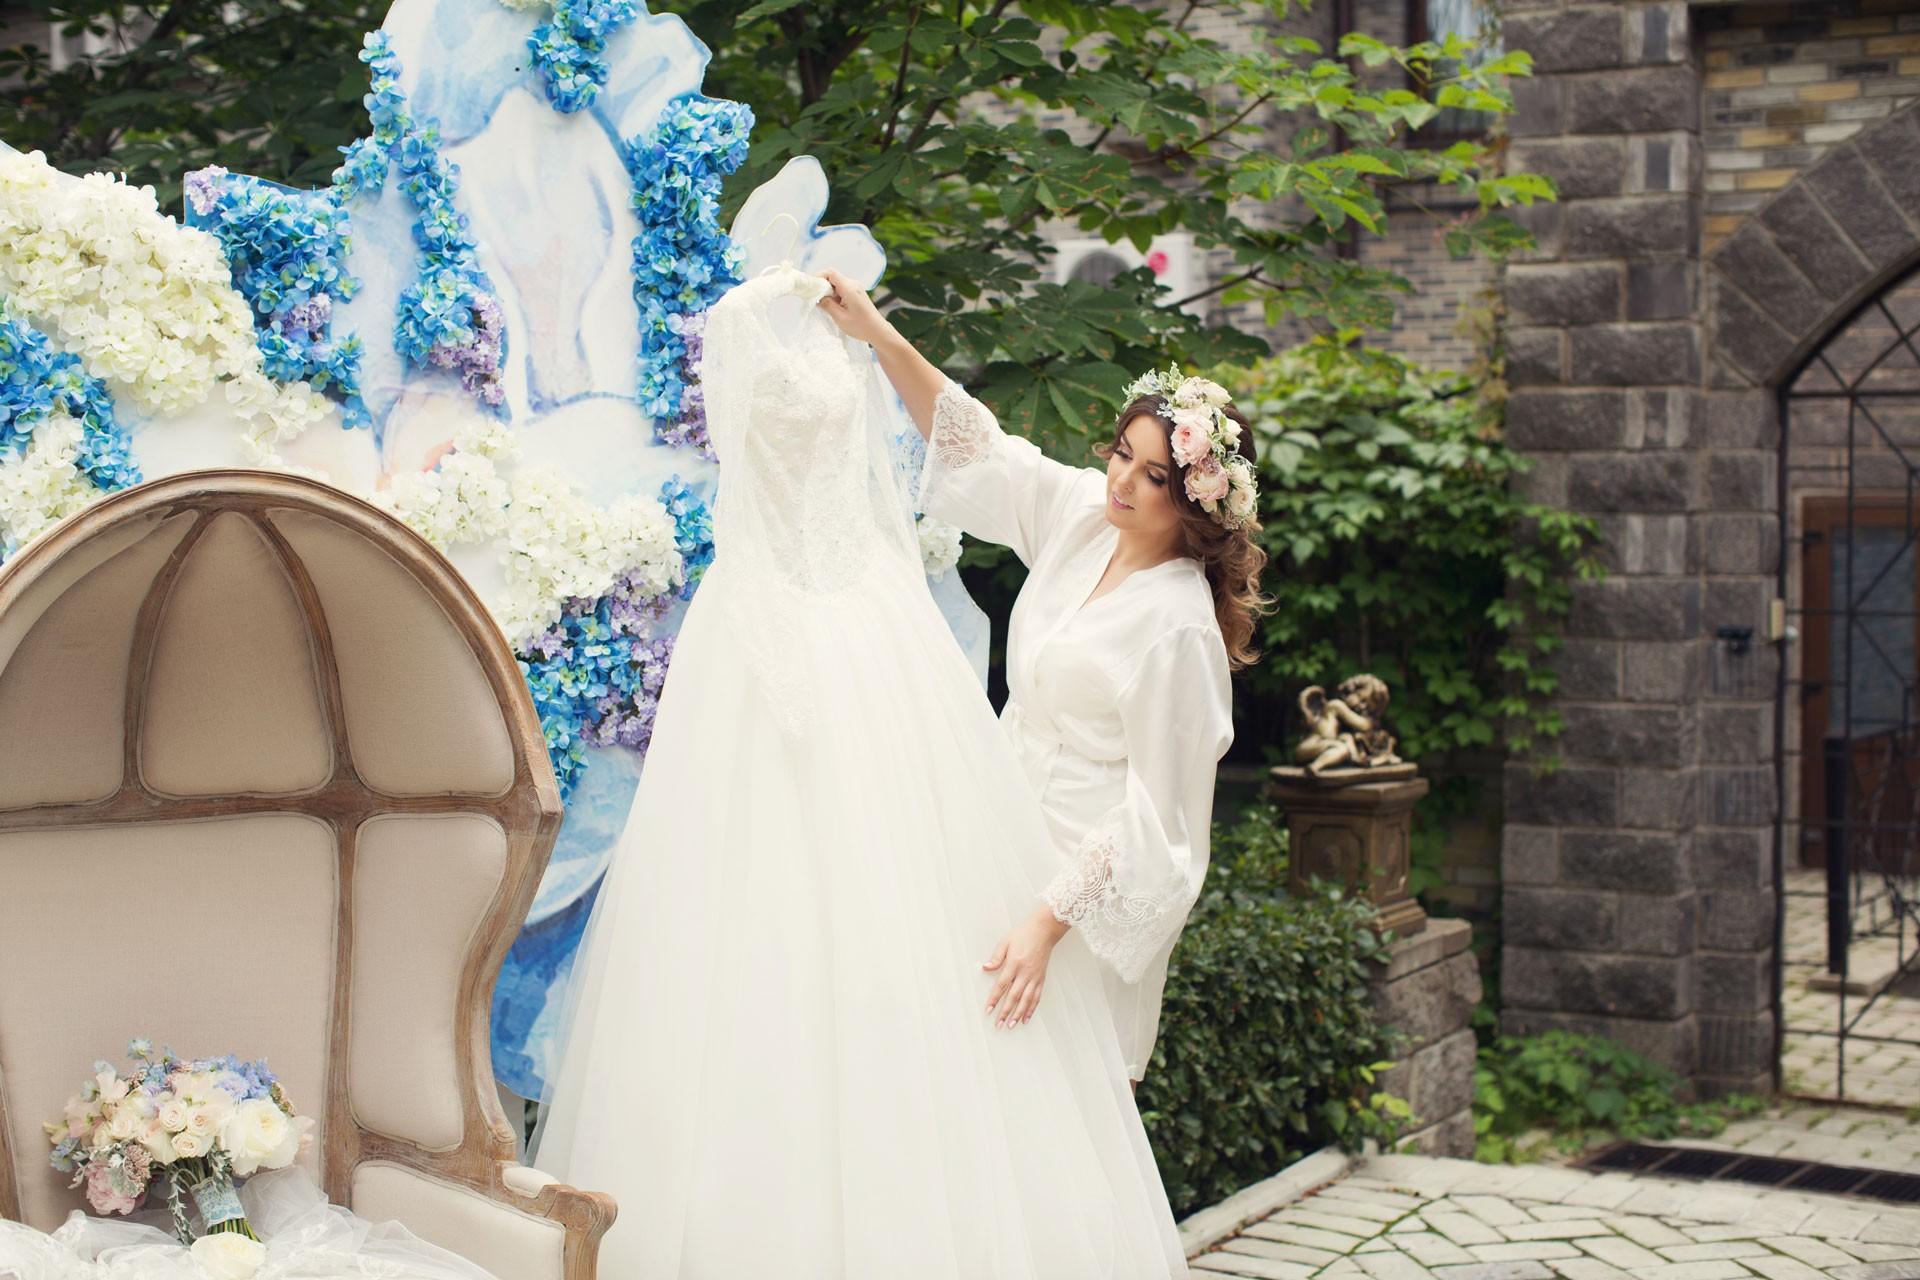 Декоратор Полина Сухарева интервью White Decor фото 17